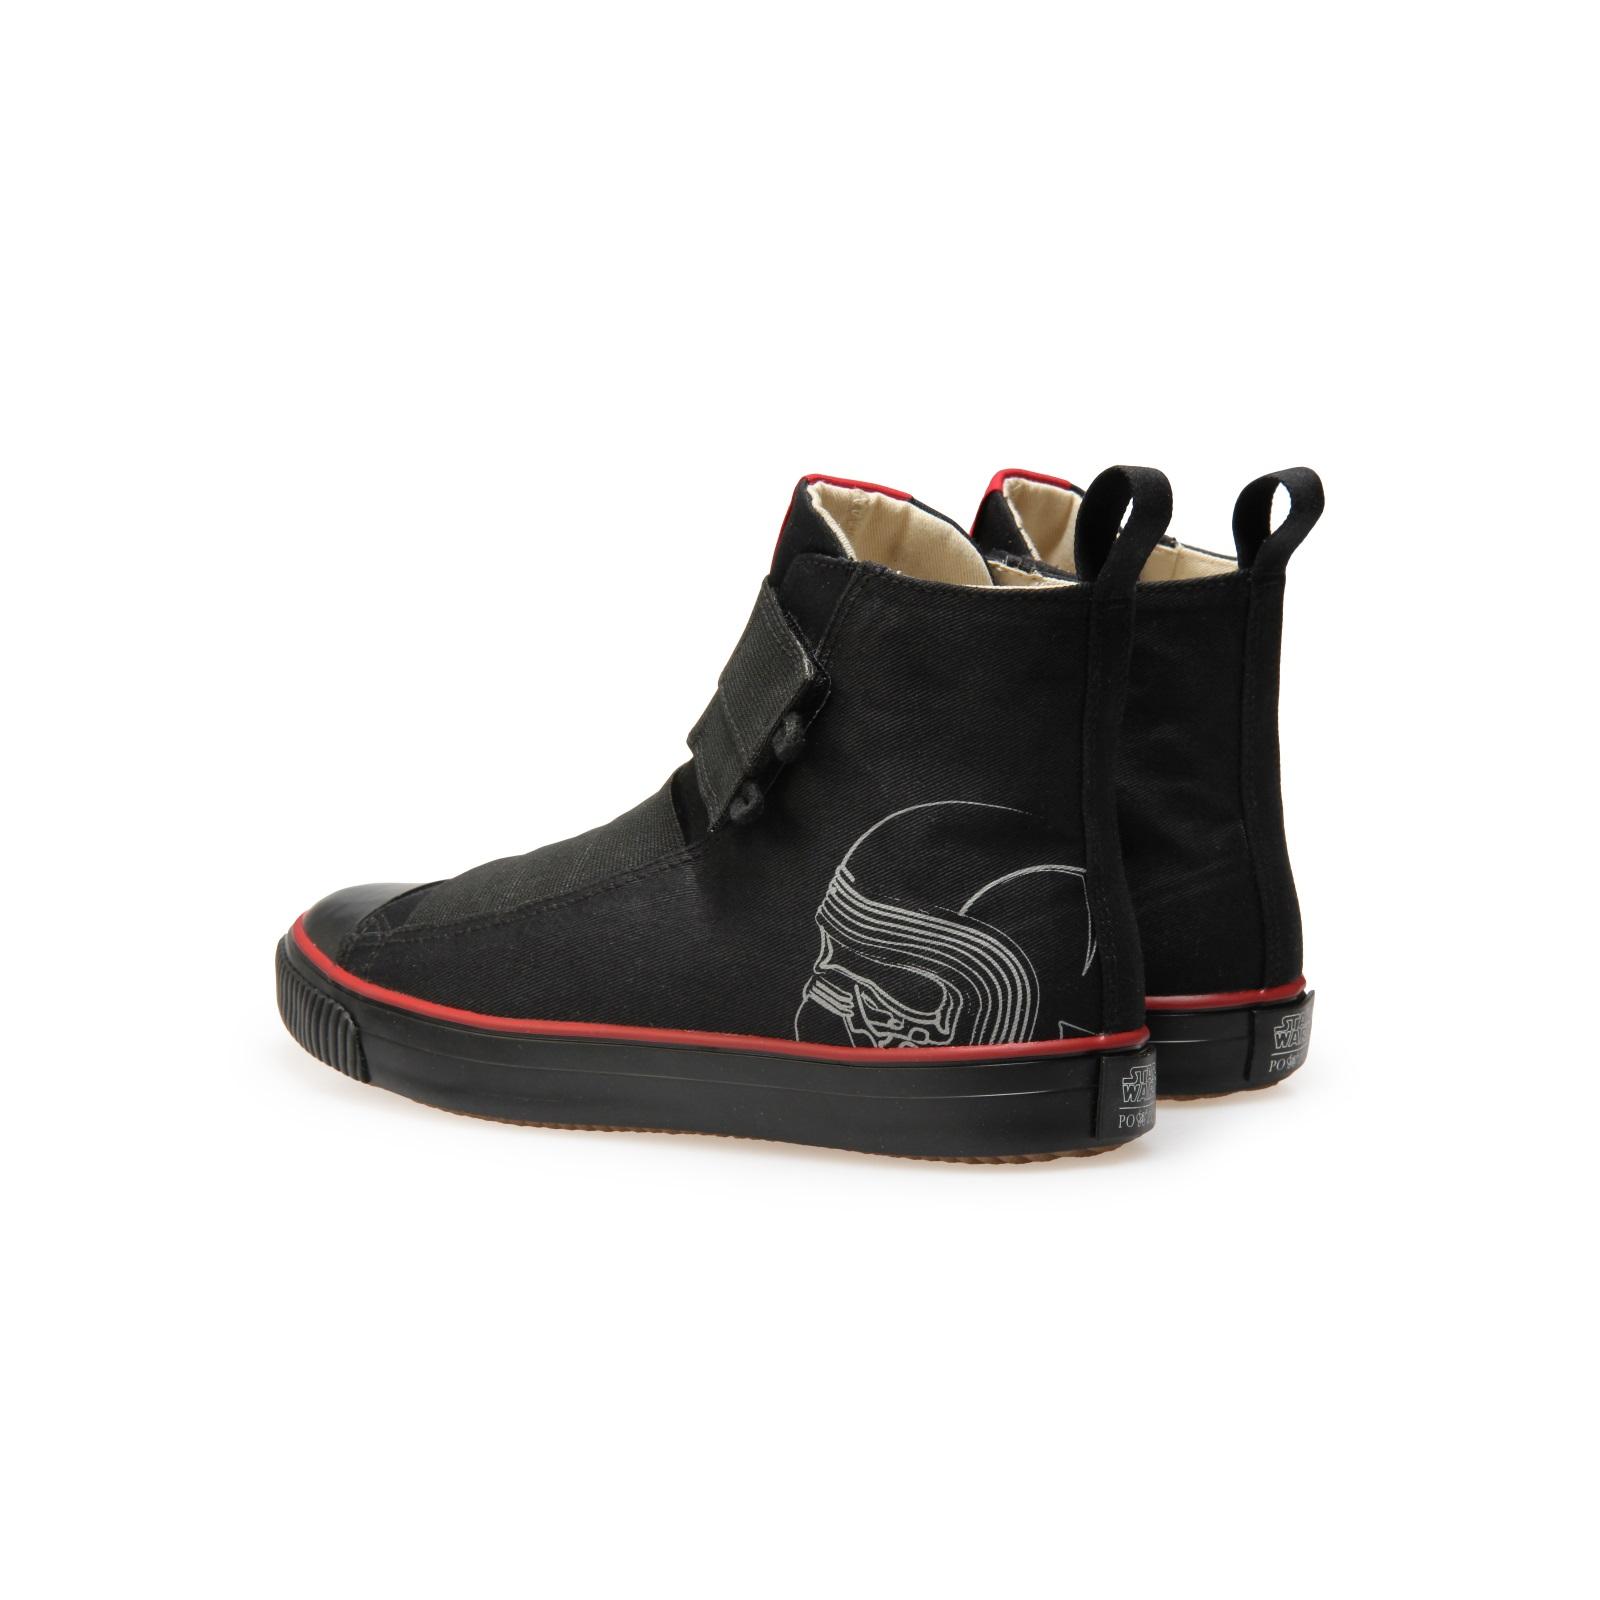 Po-Zu x Star Wars Kylo Ren High-Top Sneakers